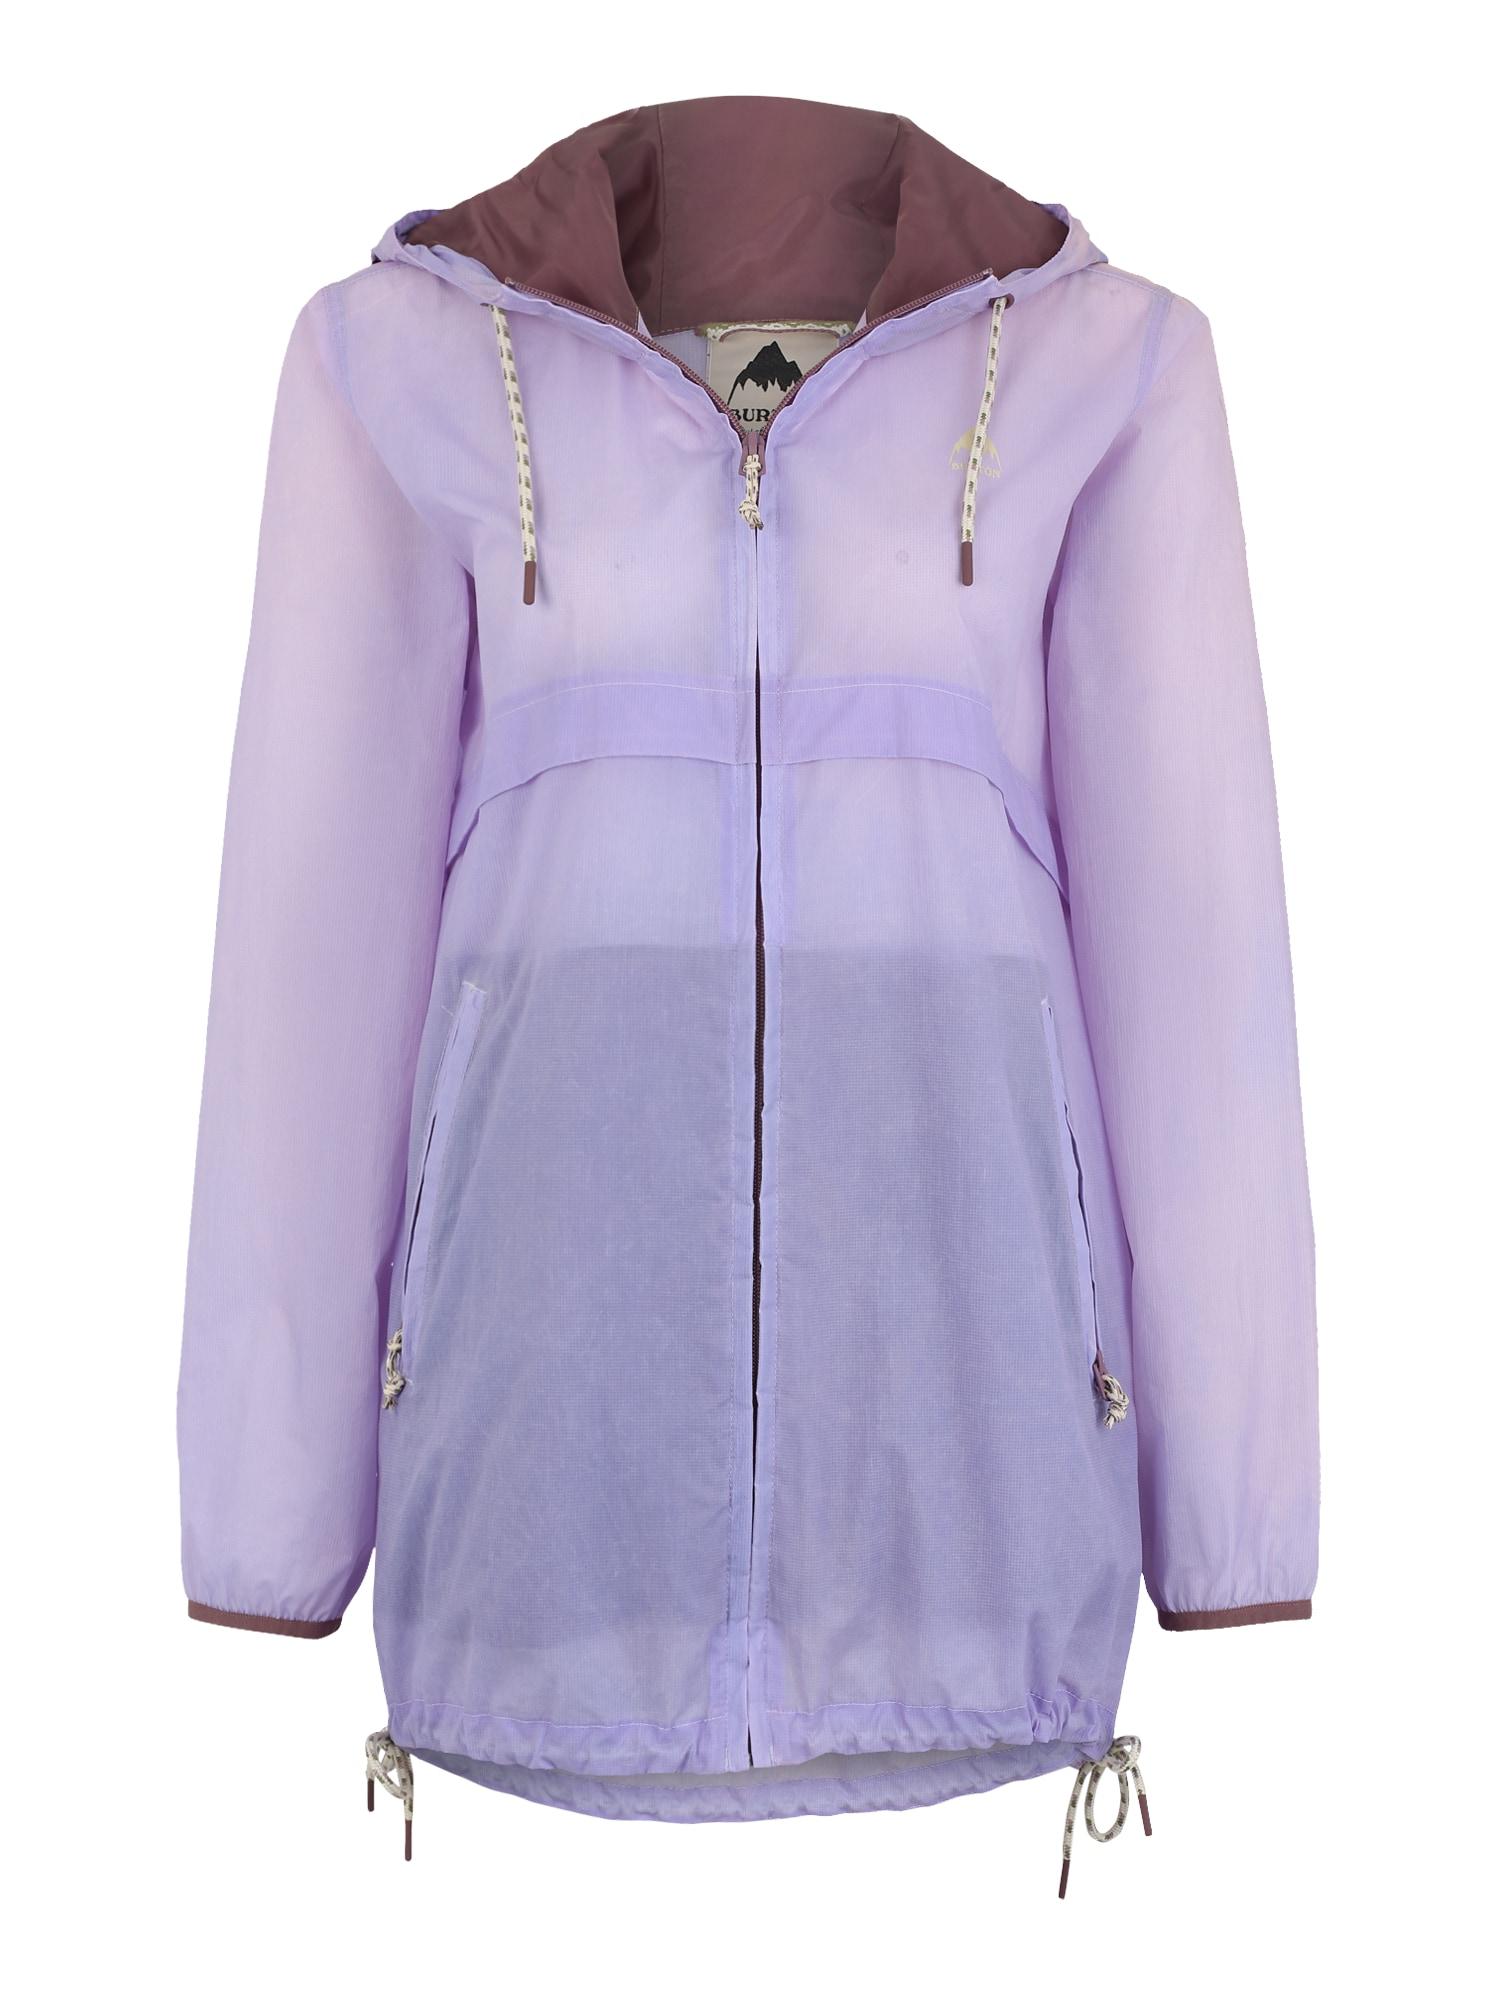 Outdoorová bunda Hazlett Packable fialová BURTON